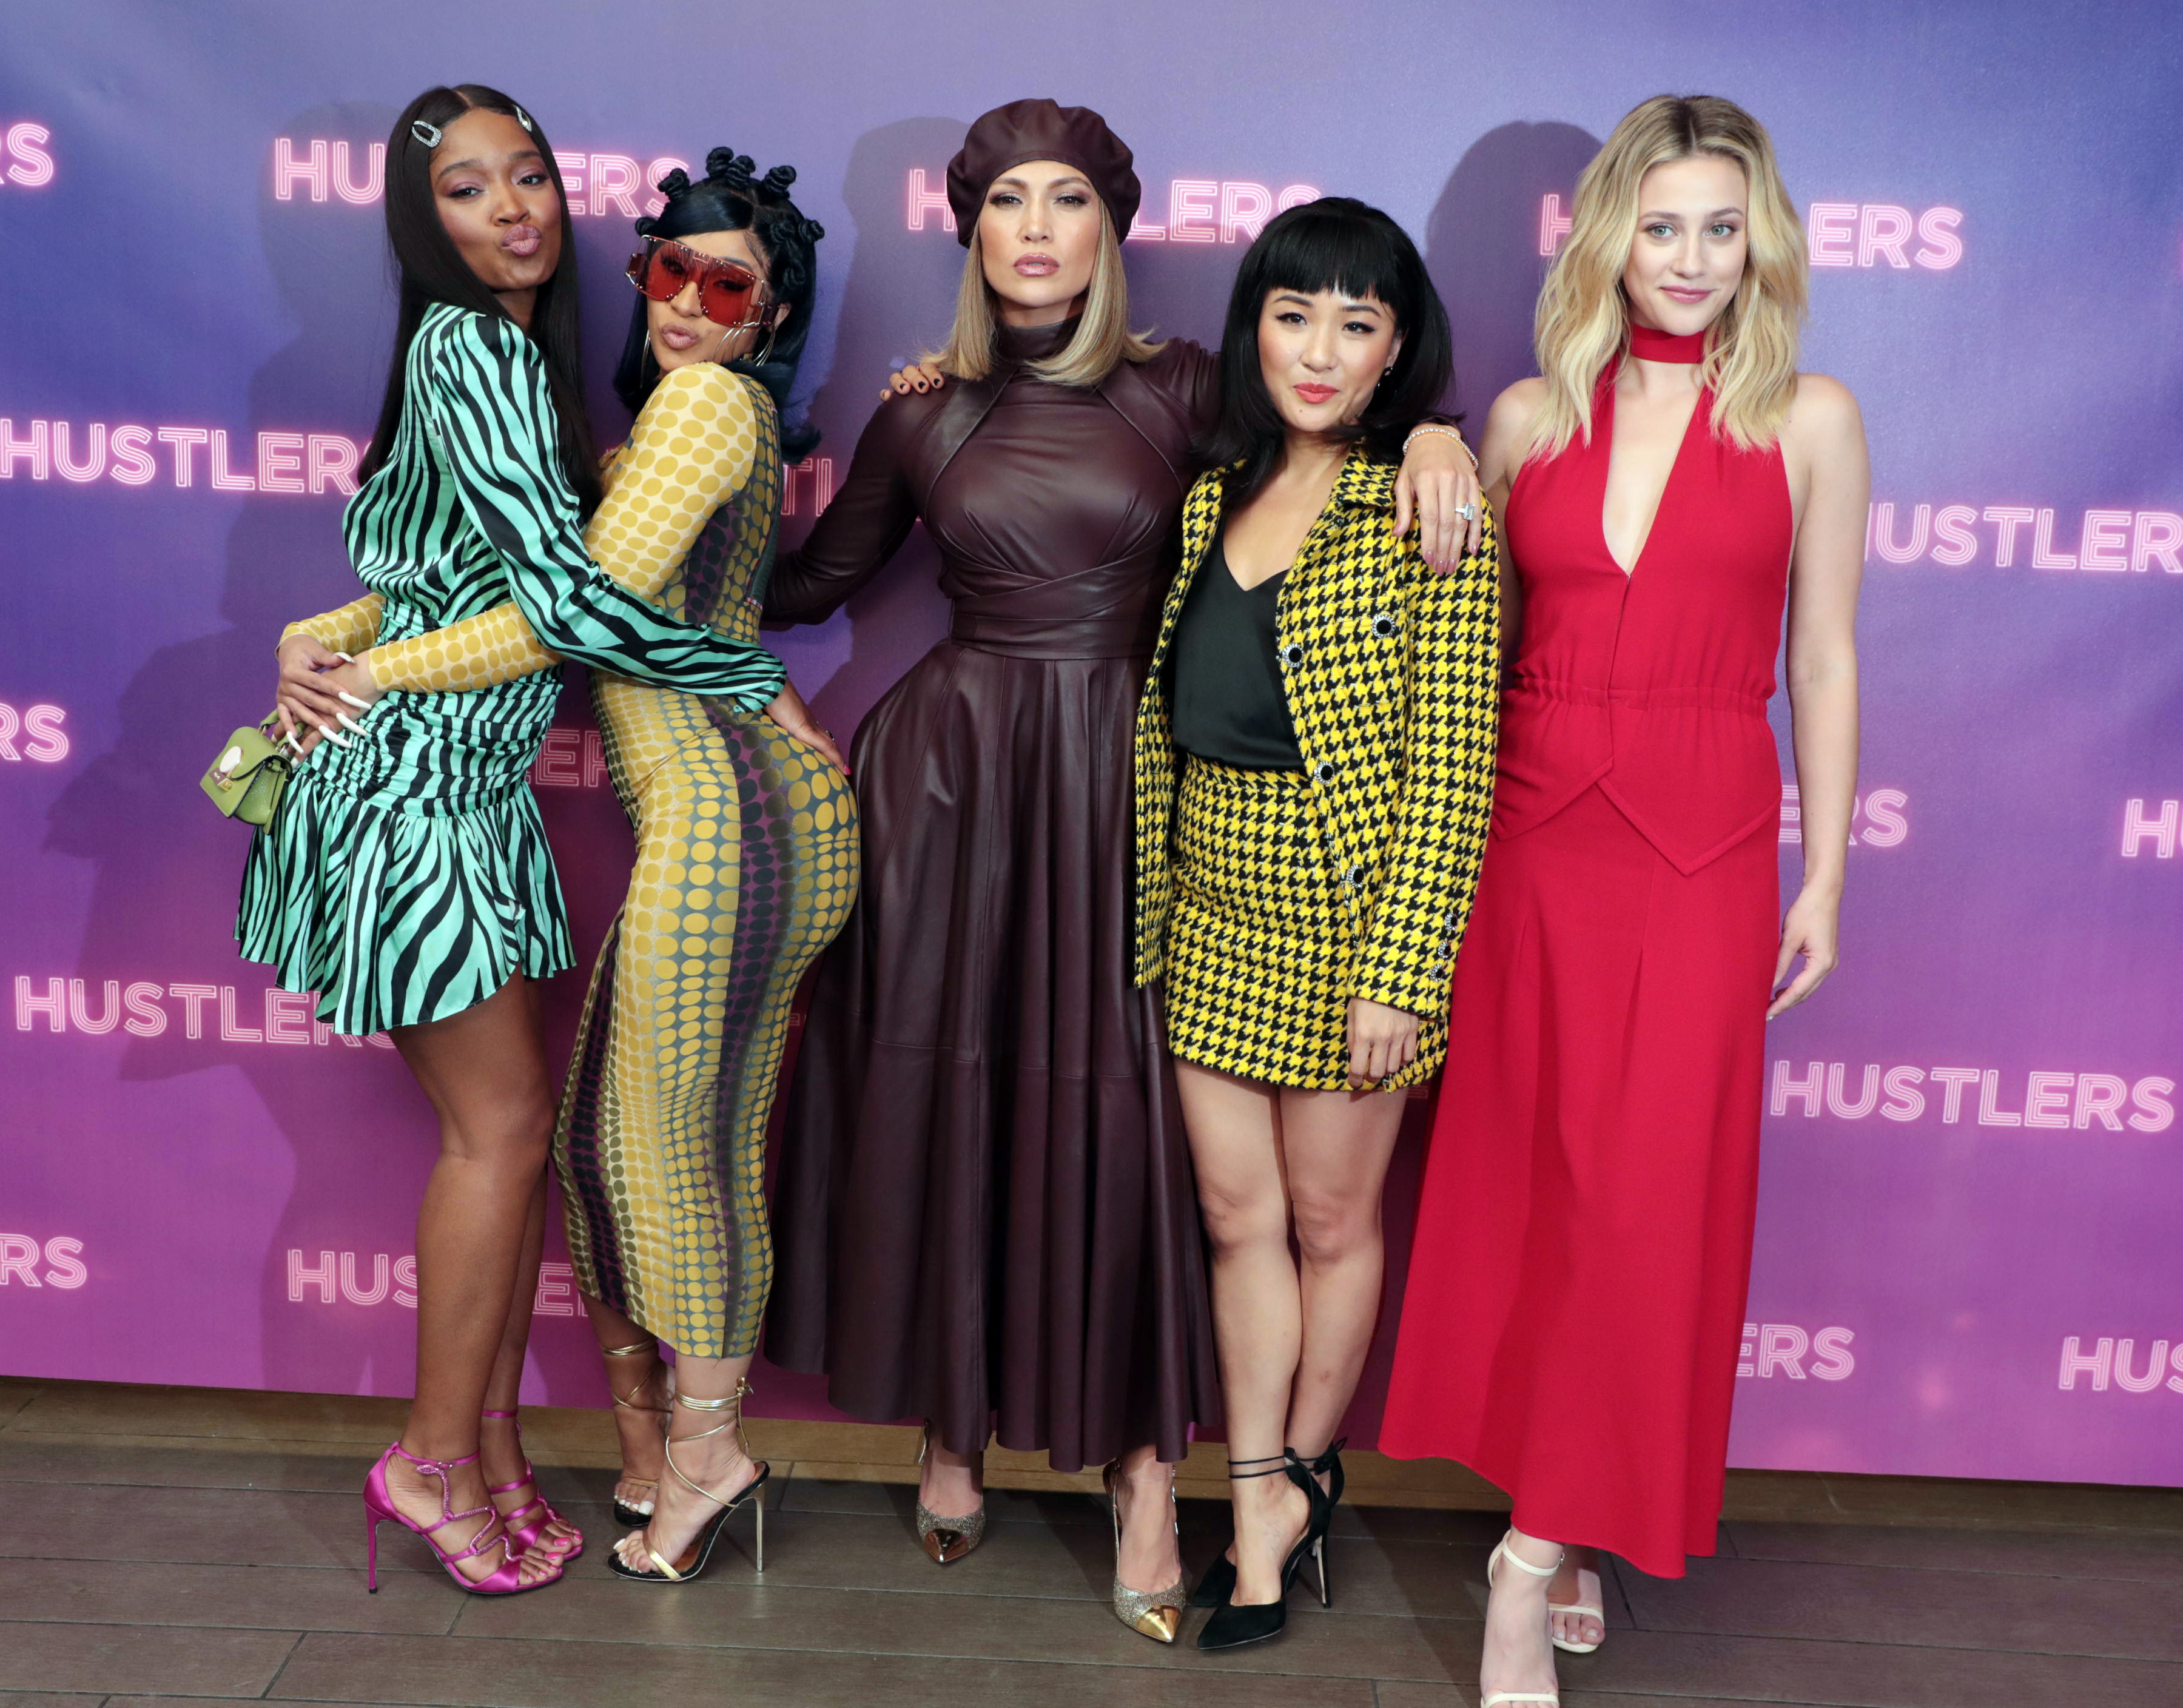 Keke Palmer, Cardi B, Jennifer Lopez, Constance Wu and Lili Reinhart